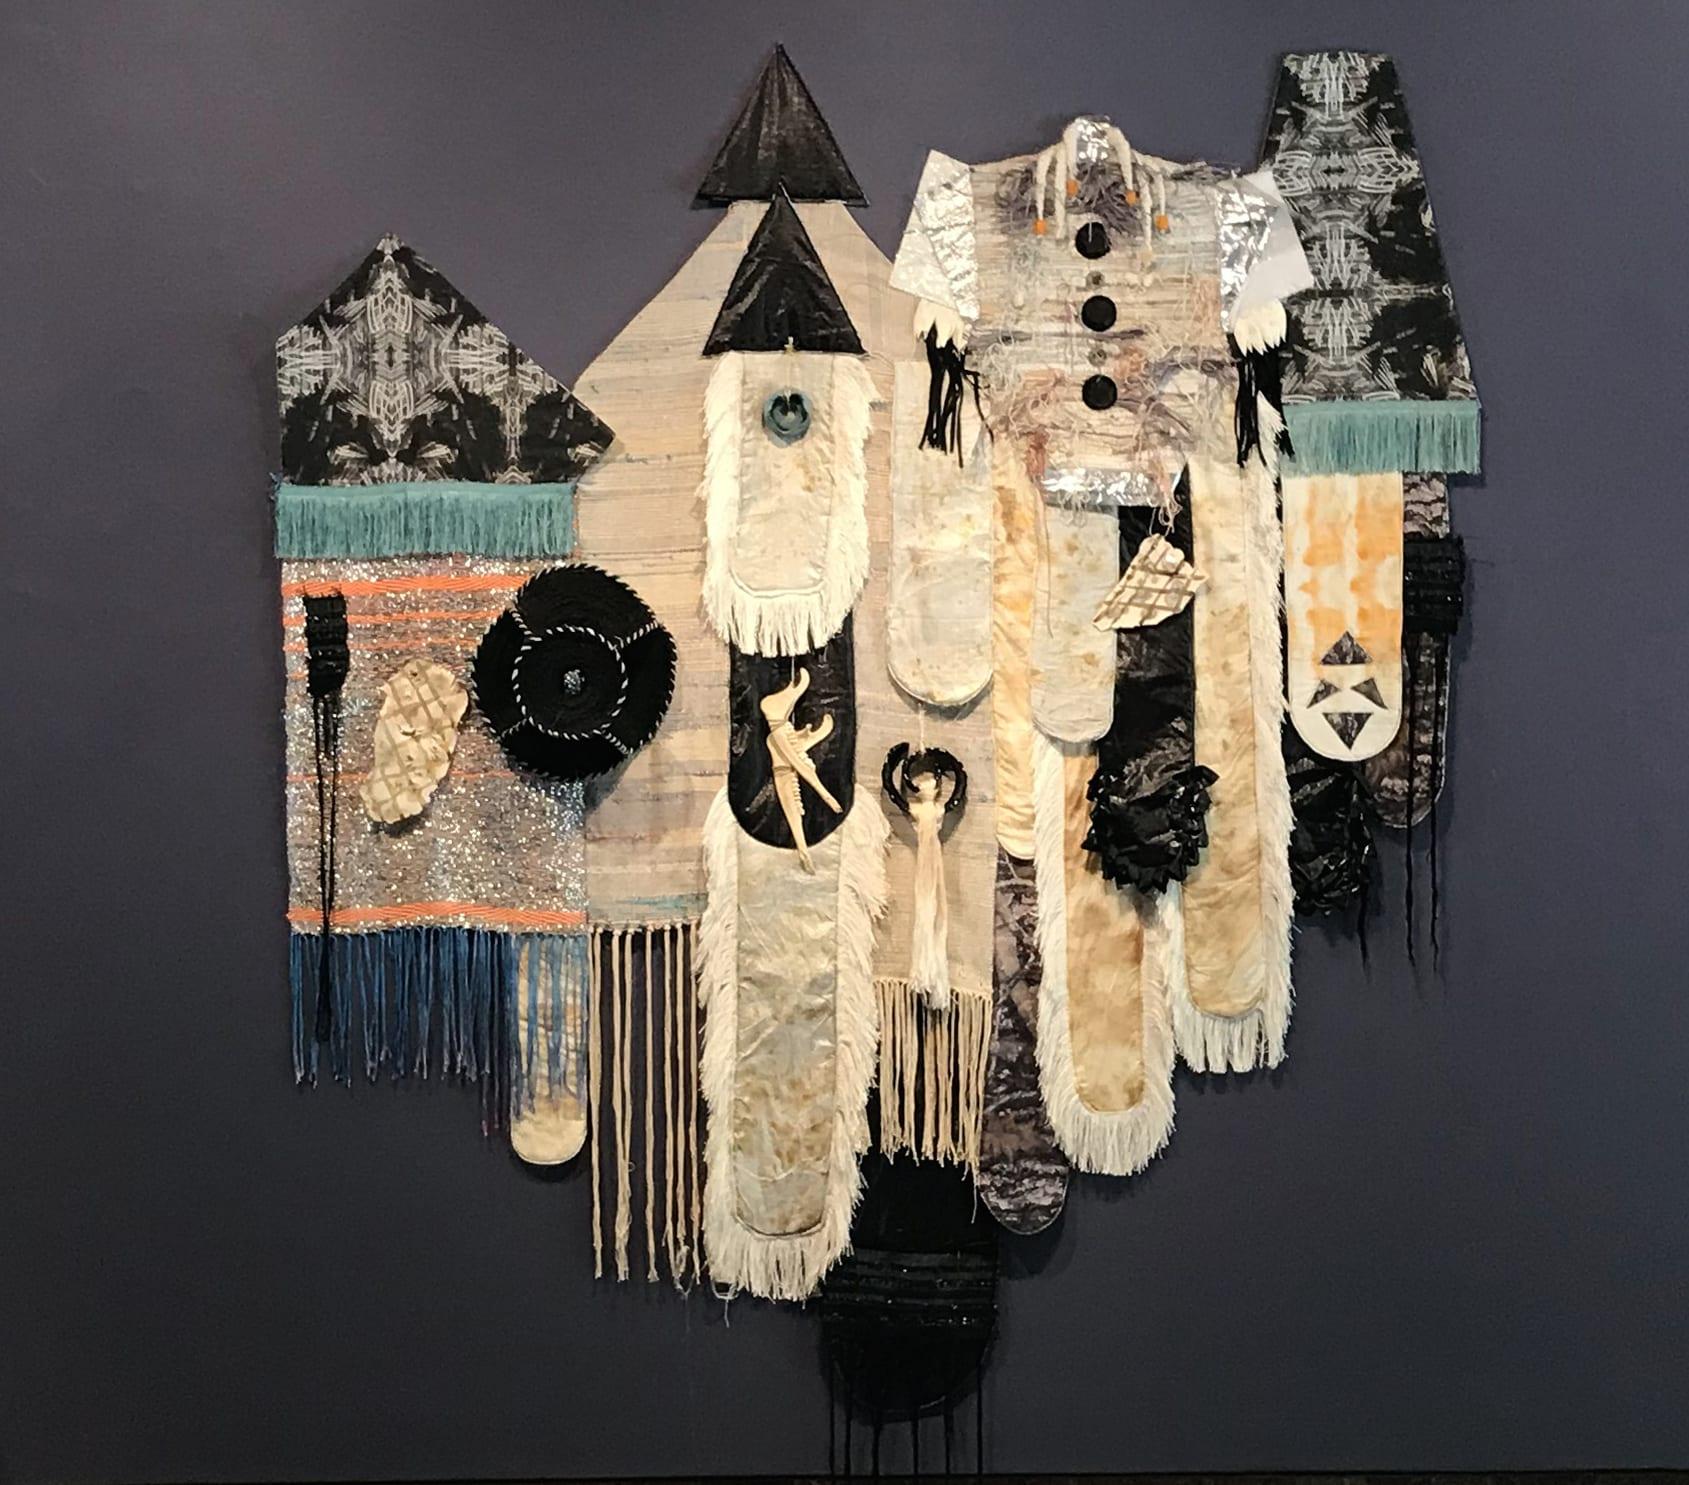 mixed media artwork by artist Zipporah Camille Thompson